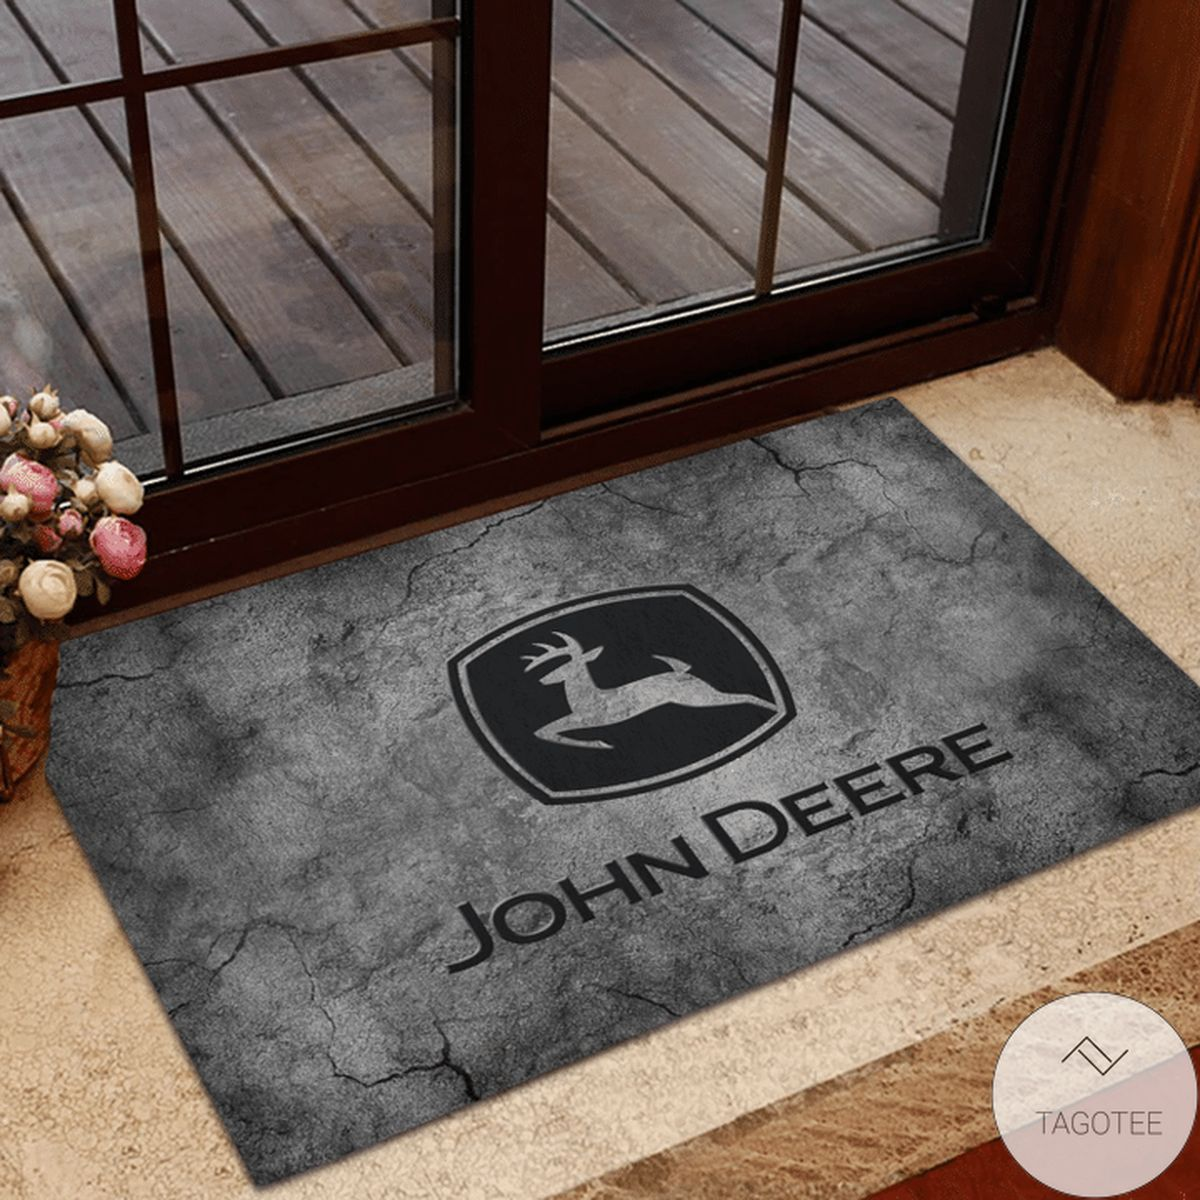 Where To Buy John Deere 3D Printed Doormat